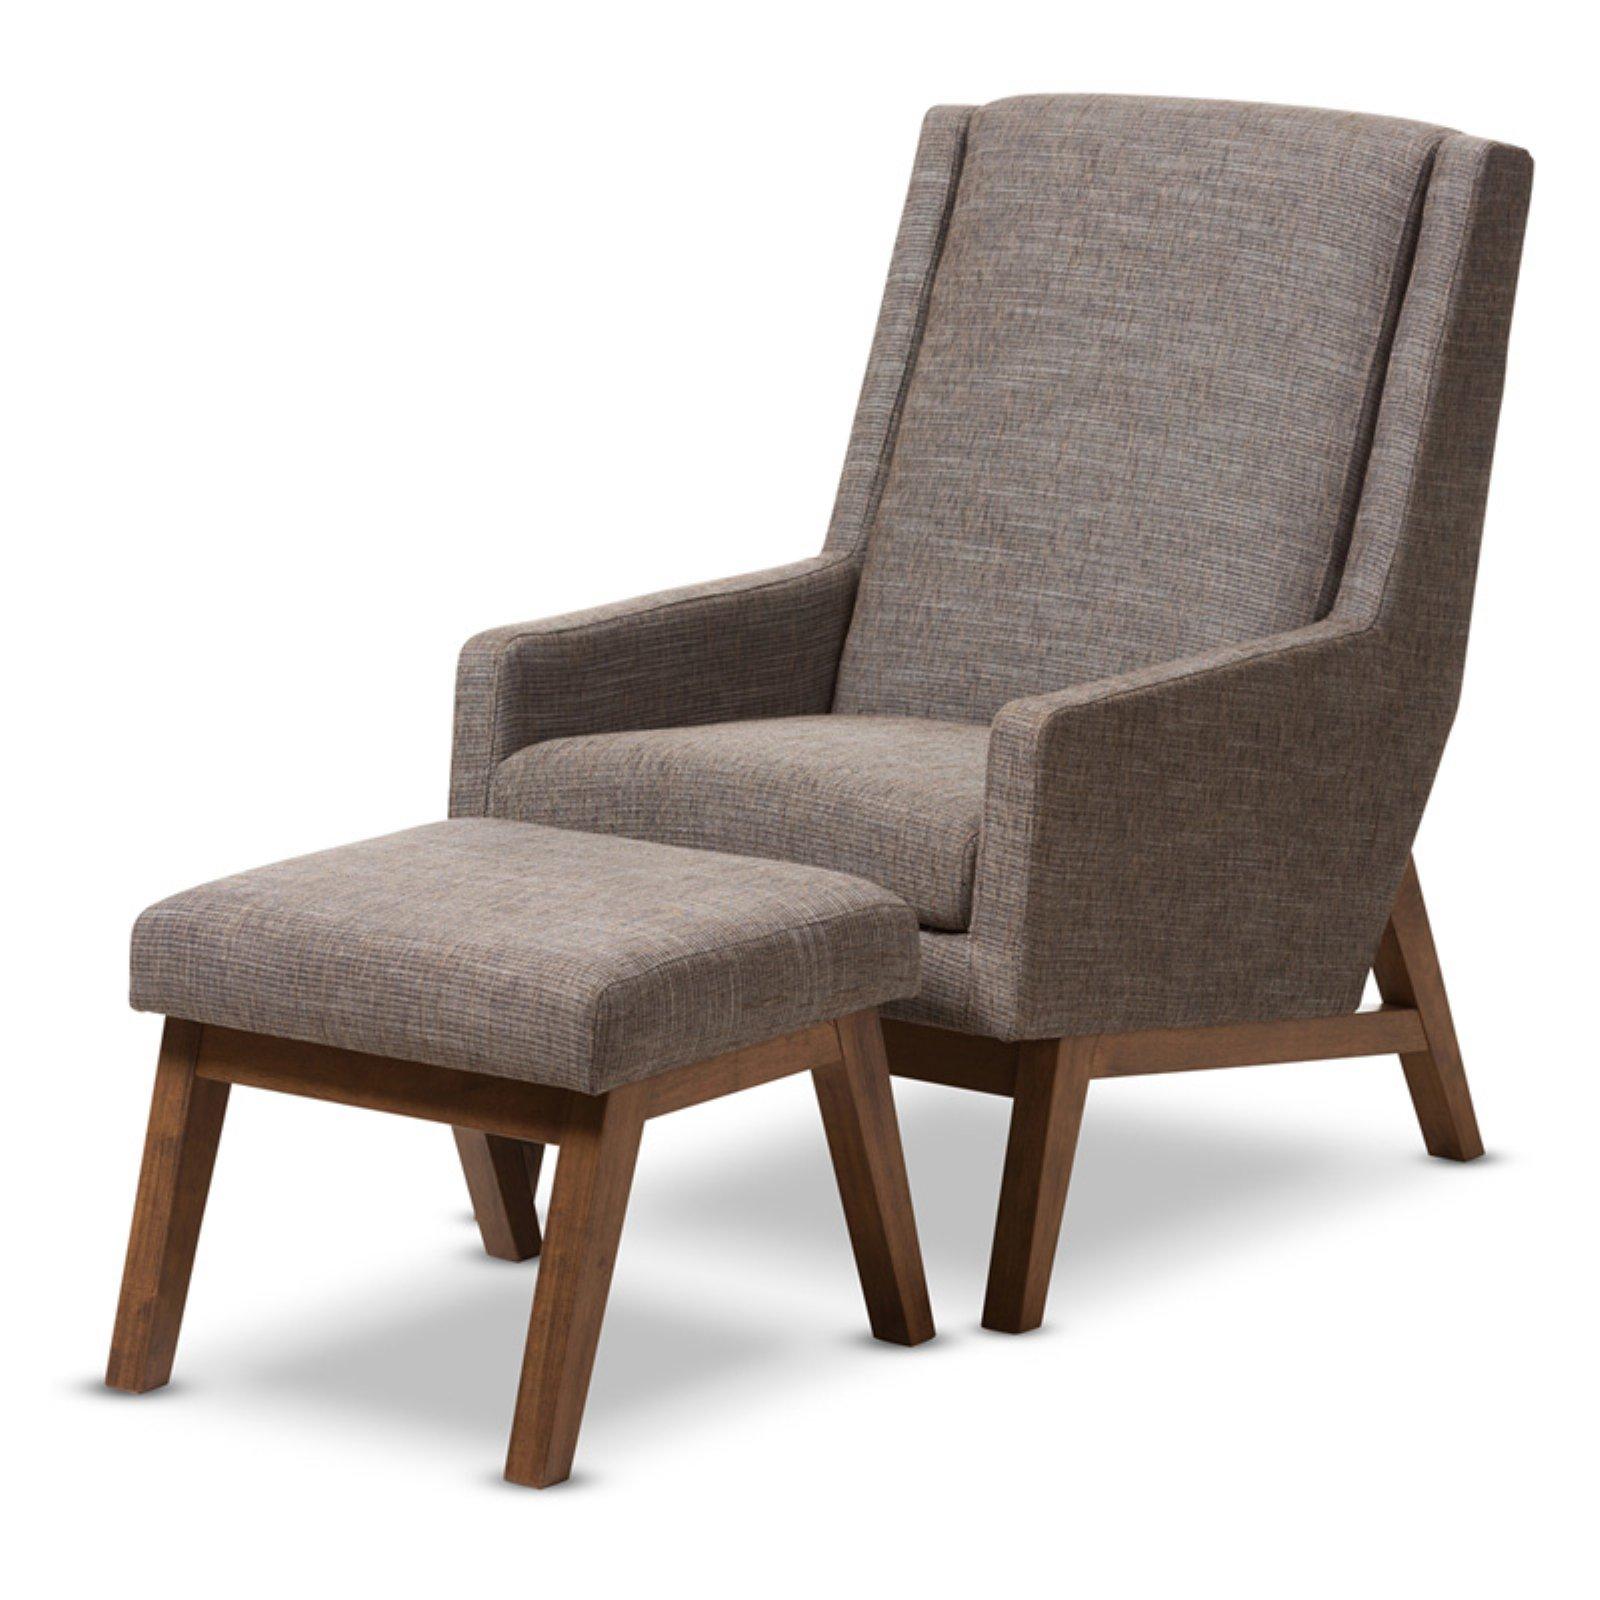 Baxton Studio Aberdeen Mid-Century Modern Walnut Wood Finishing and Gravel Fabric Upholstered Lounge Chair and Ottoman Set